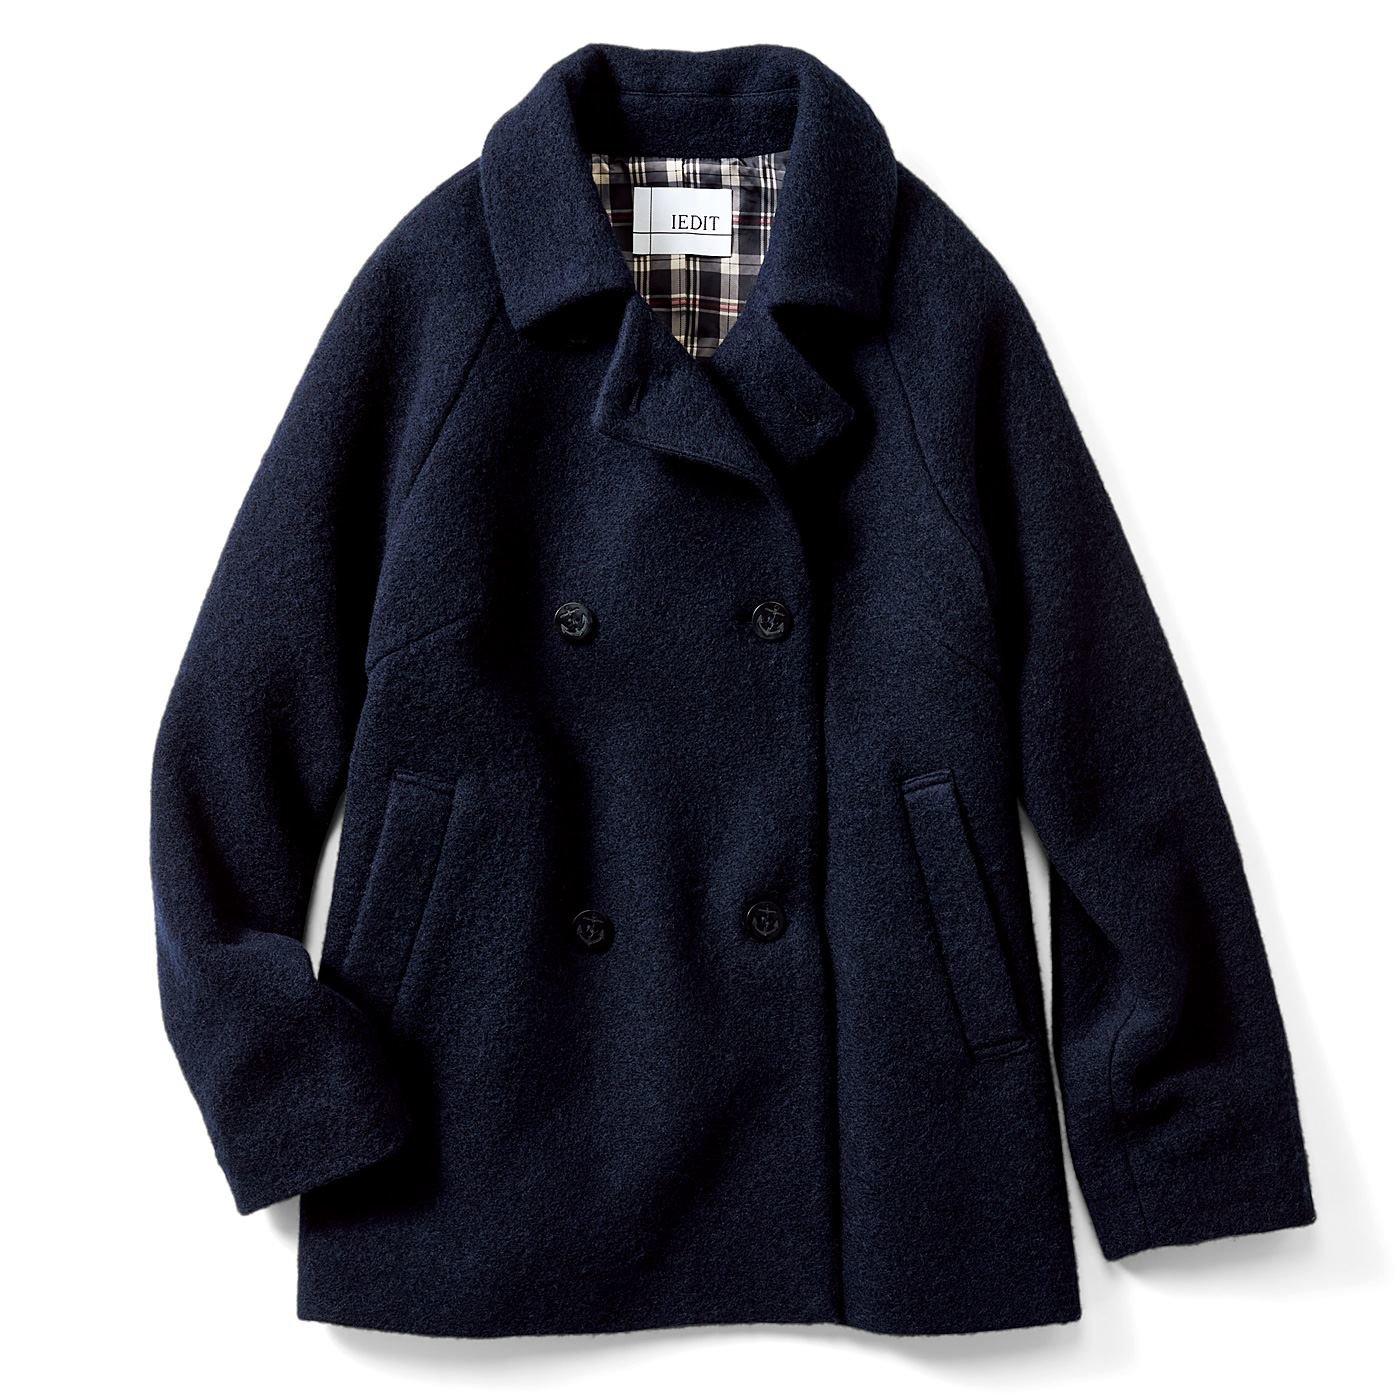 IEDIT スライバーニット素材で軽くて暖か 軽やかハーフ丈Pコート〈ネイビー〉